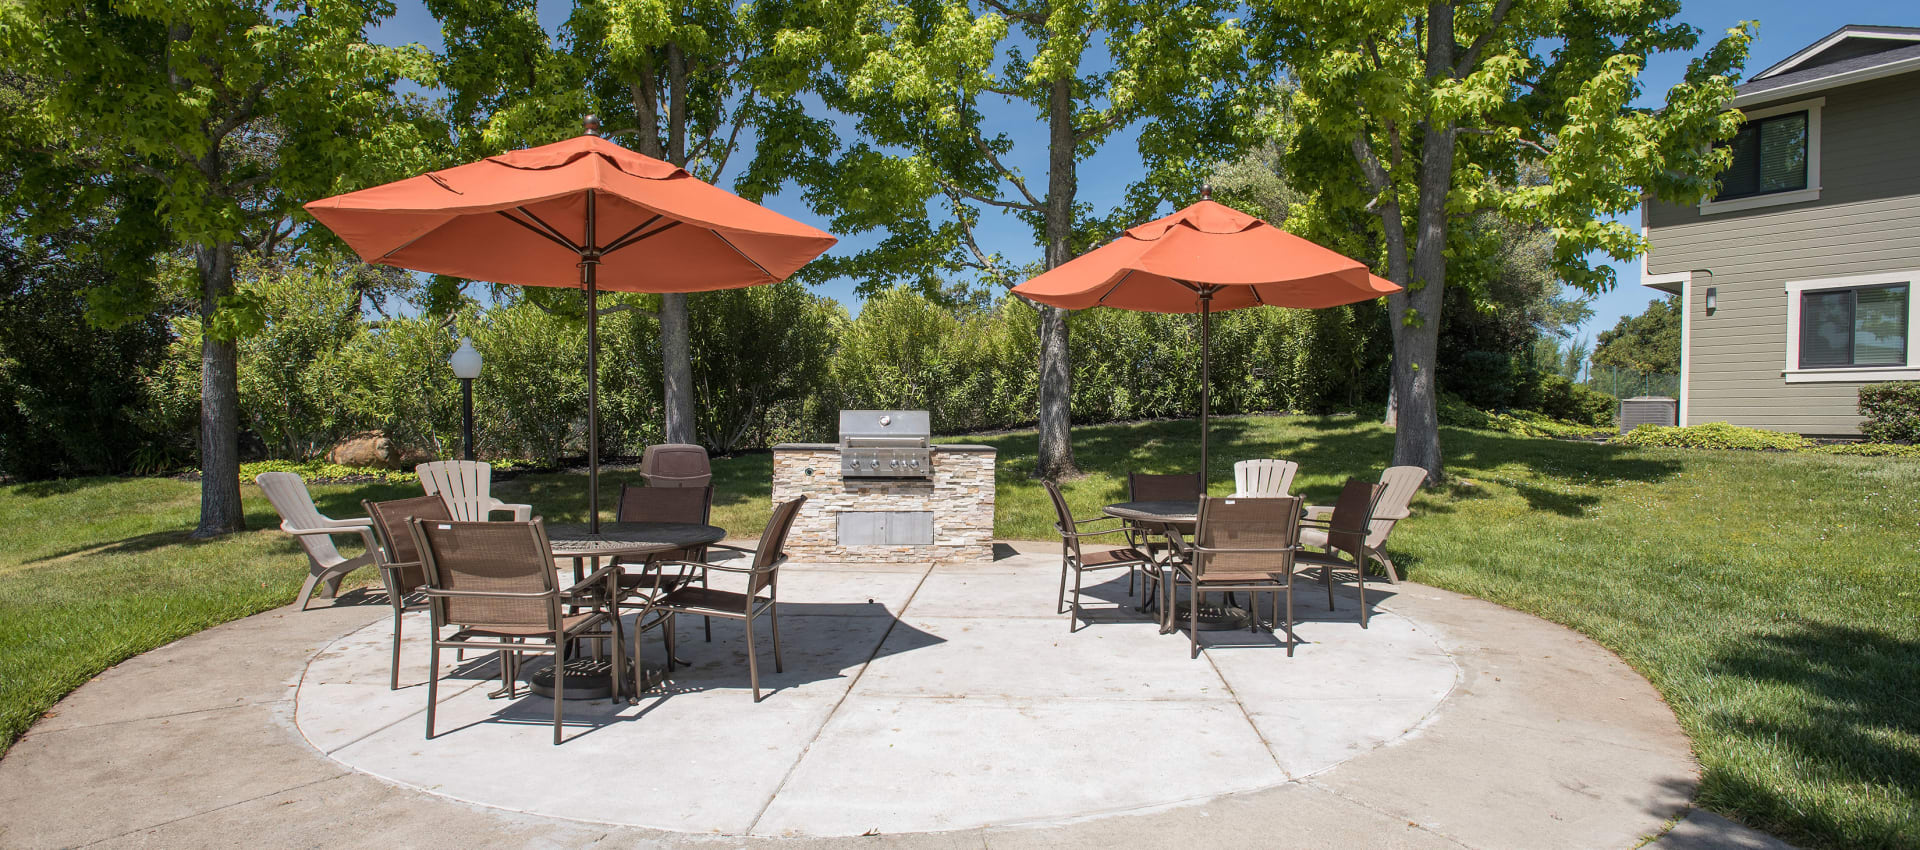 Community barbecue area at Ridgecrest Apartment Homes in Martinez, California